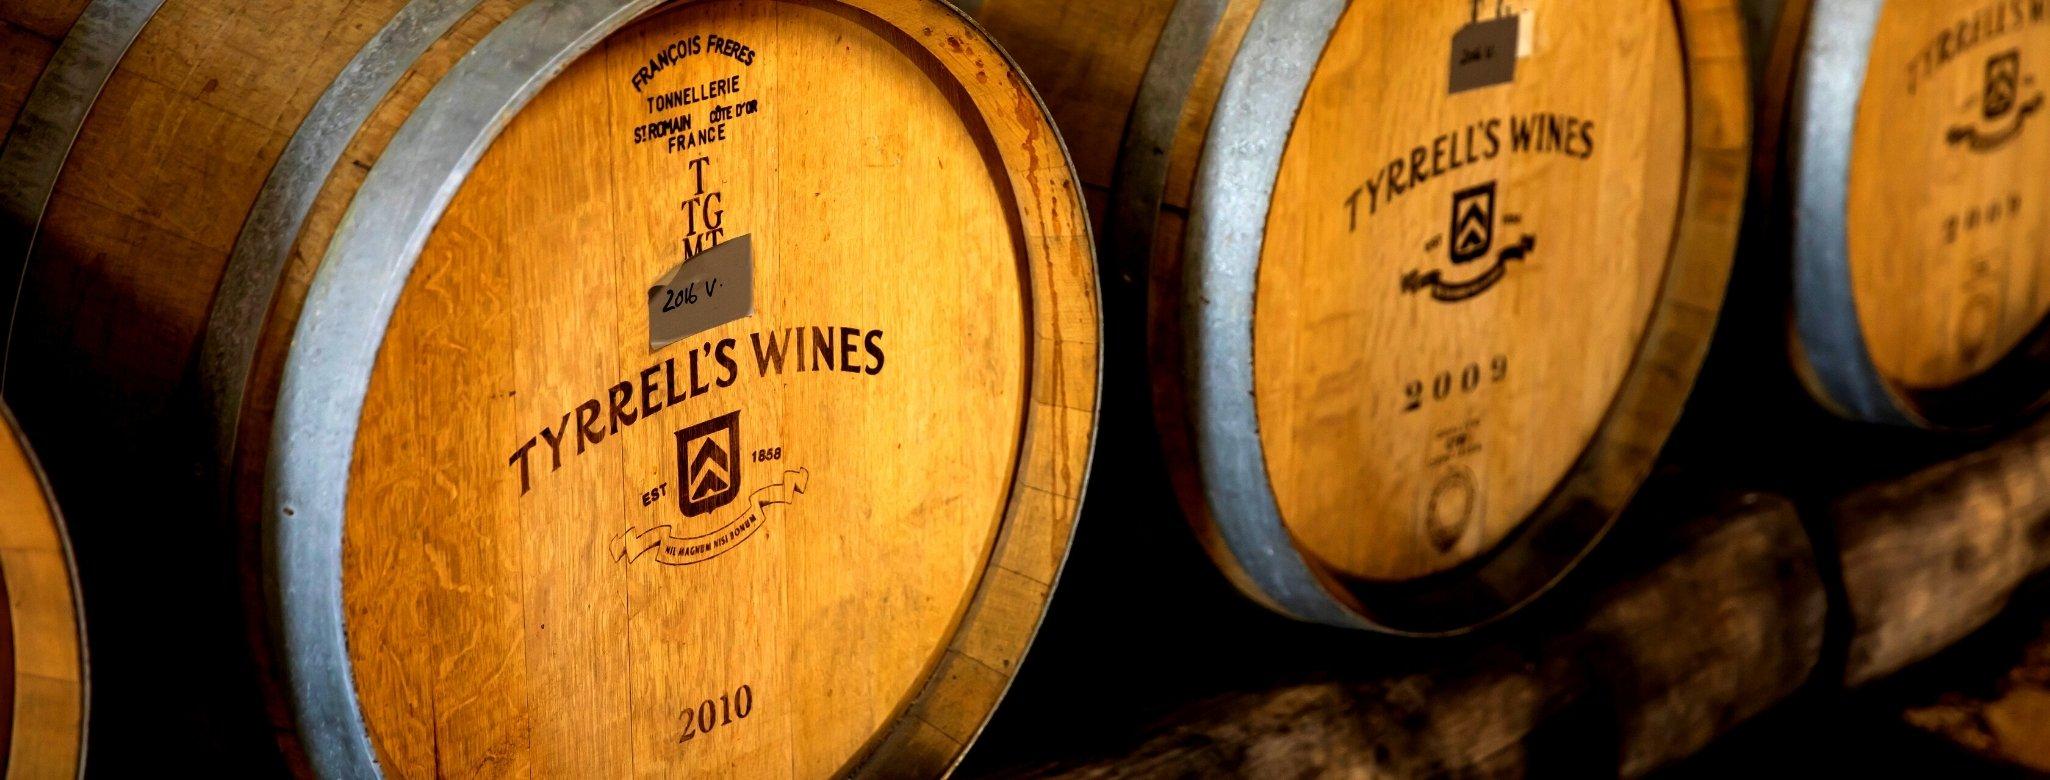 Tyrrell's Wines, Pokolbin, Hunter Valley, New South Wales